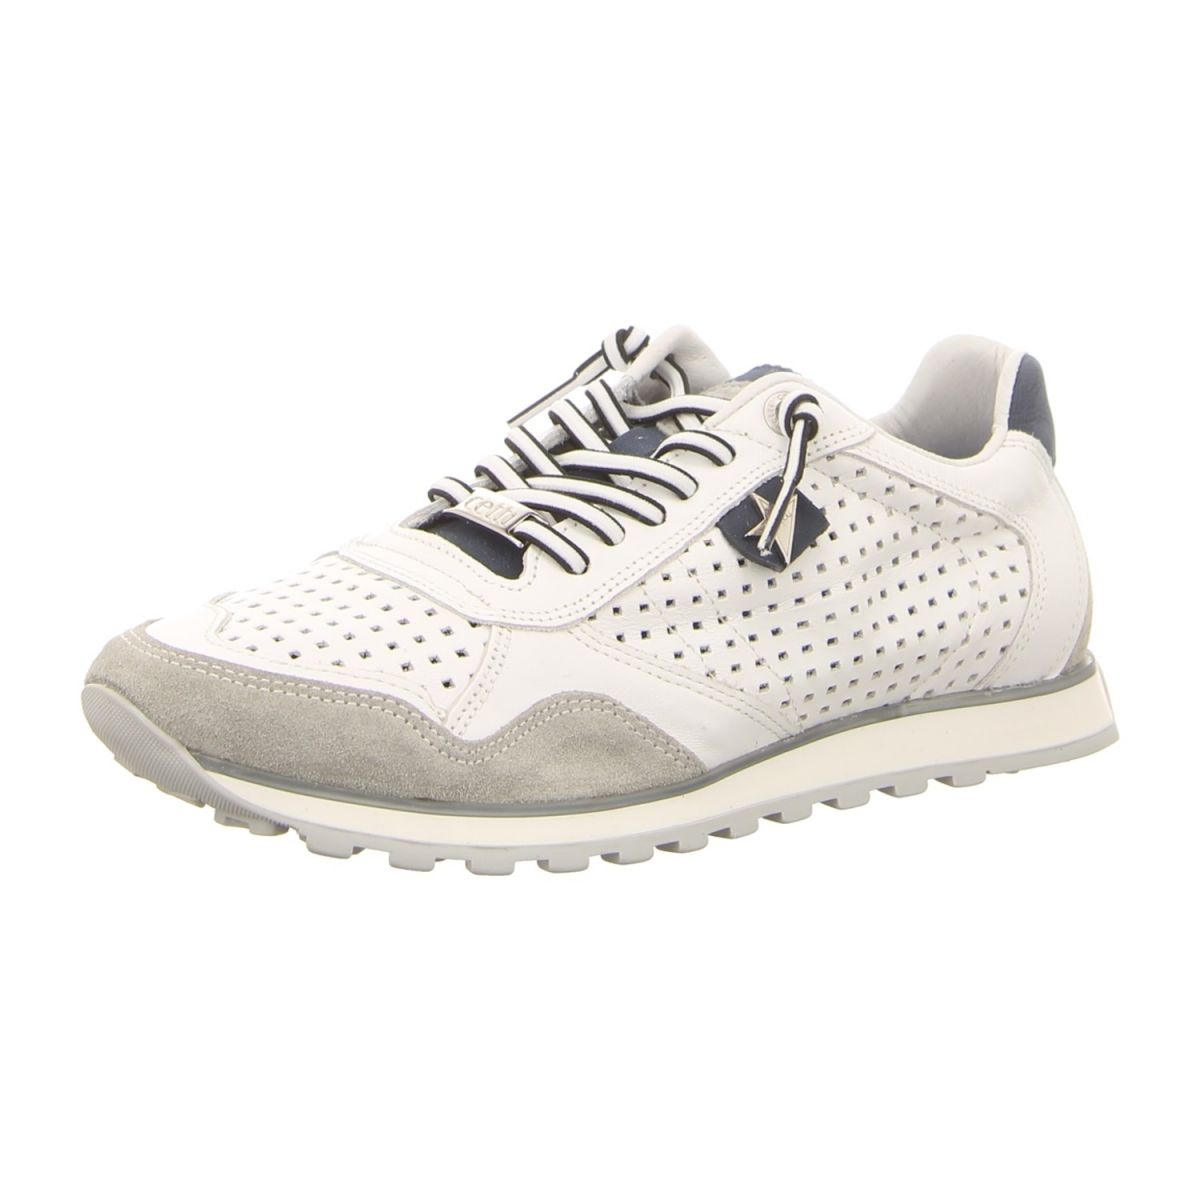 NEU: Cetti Sneaker C 848 EXP SWEET BLANCO sweet blanco